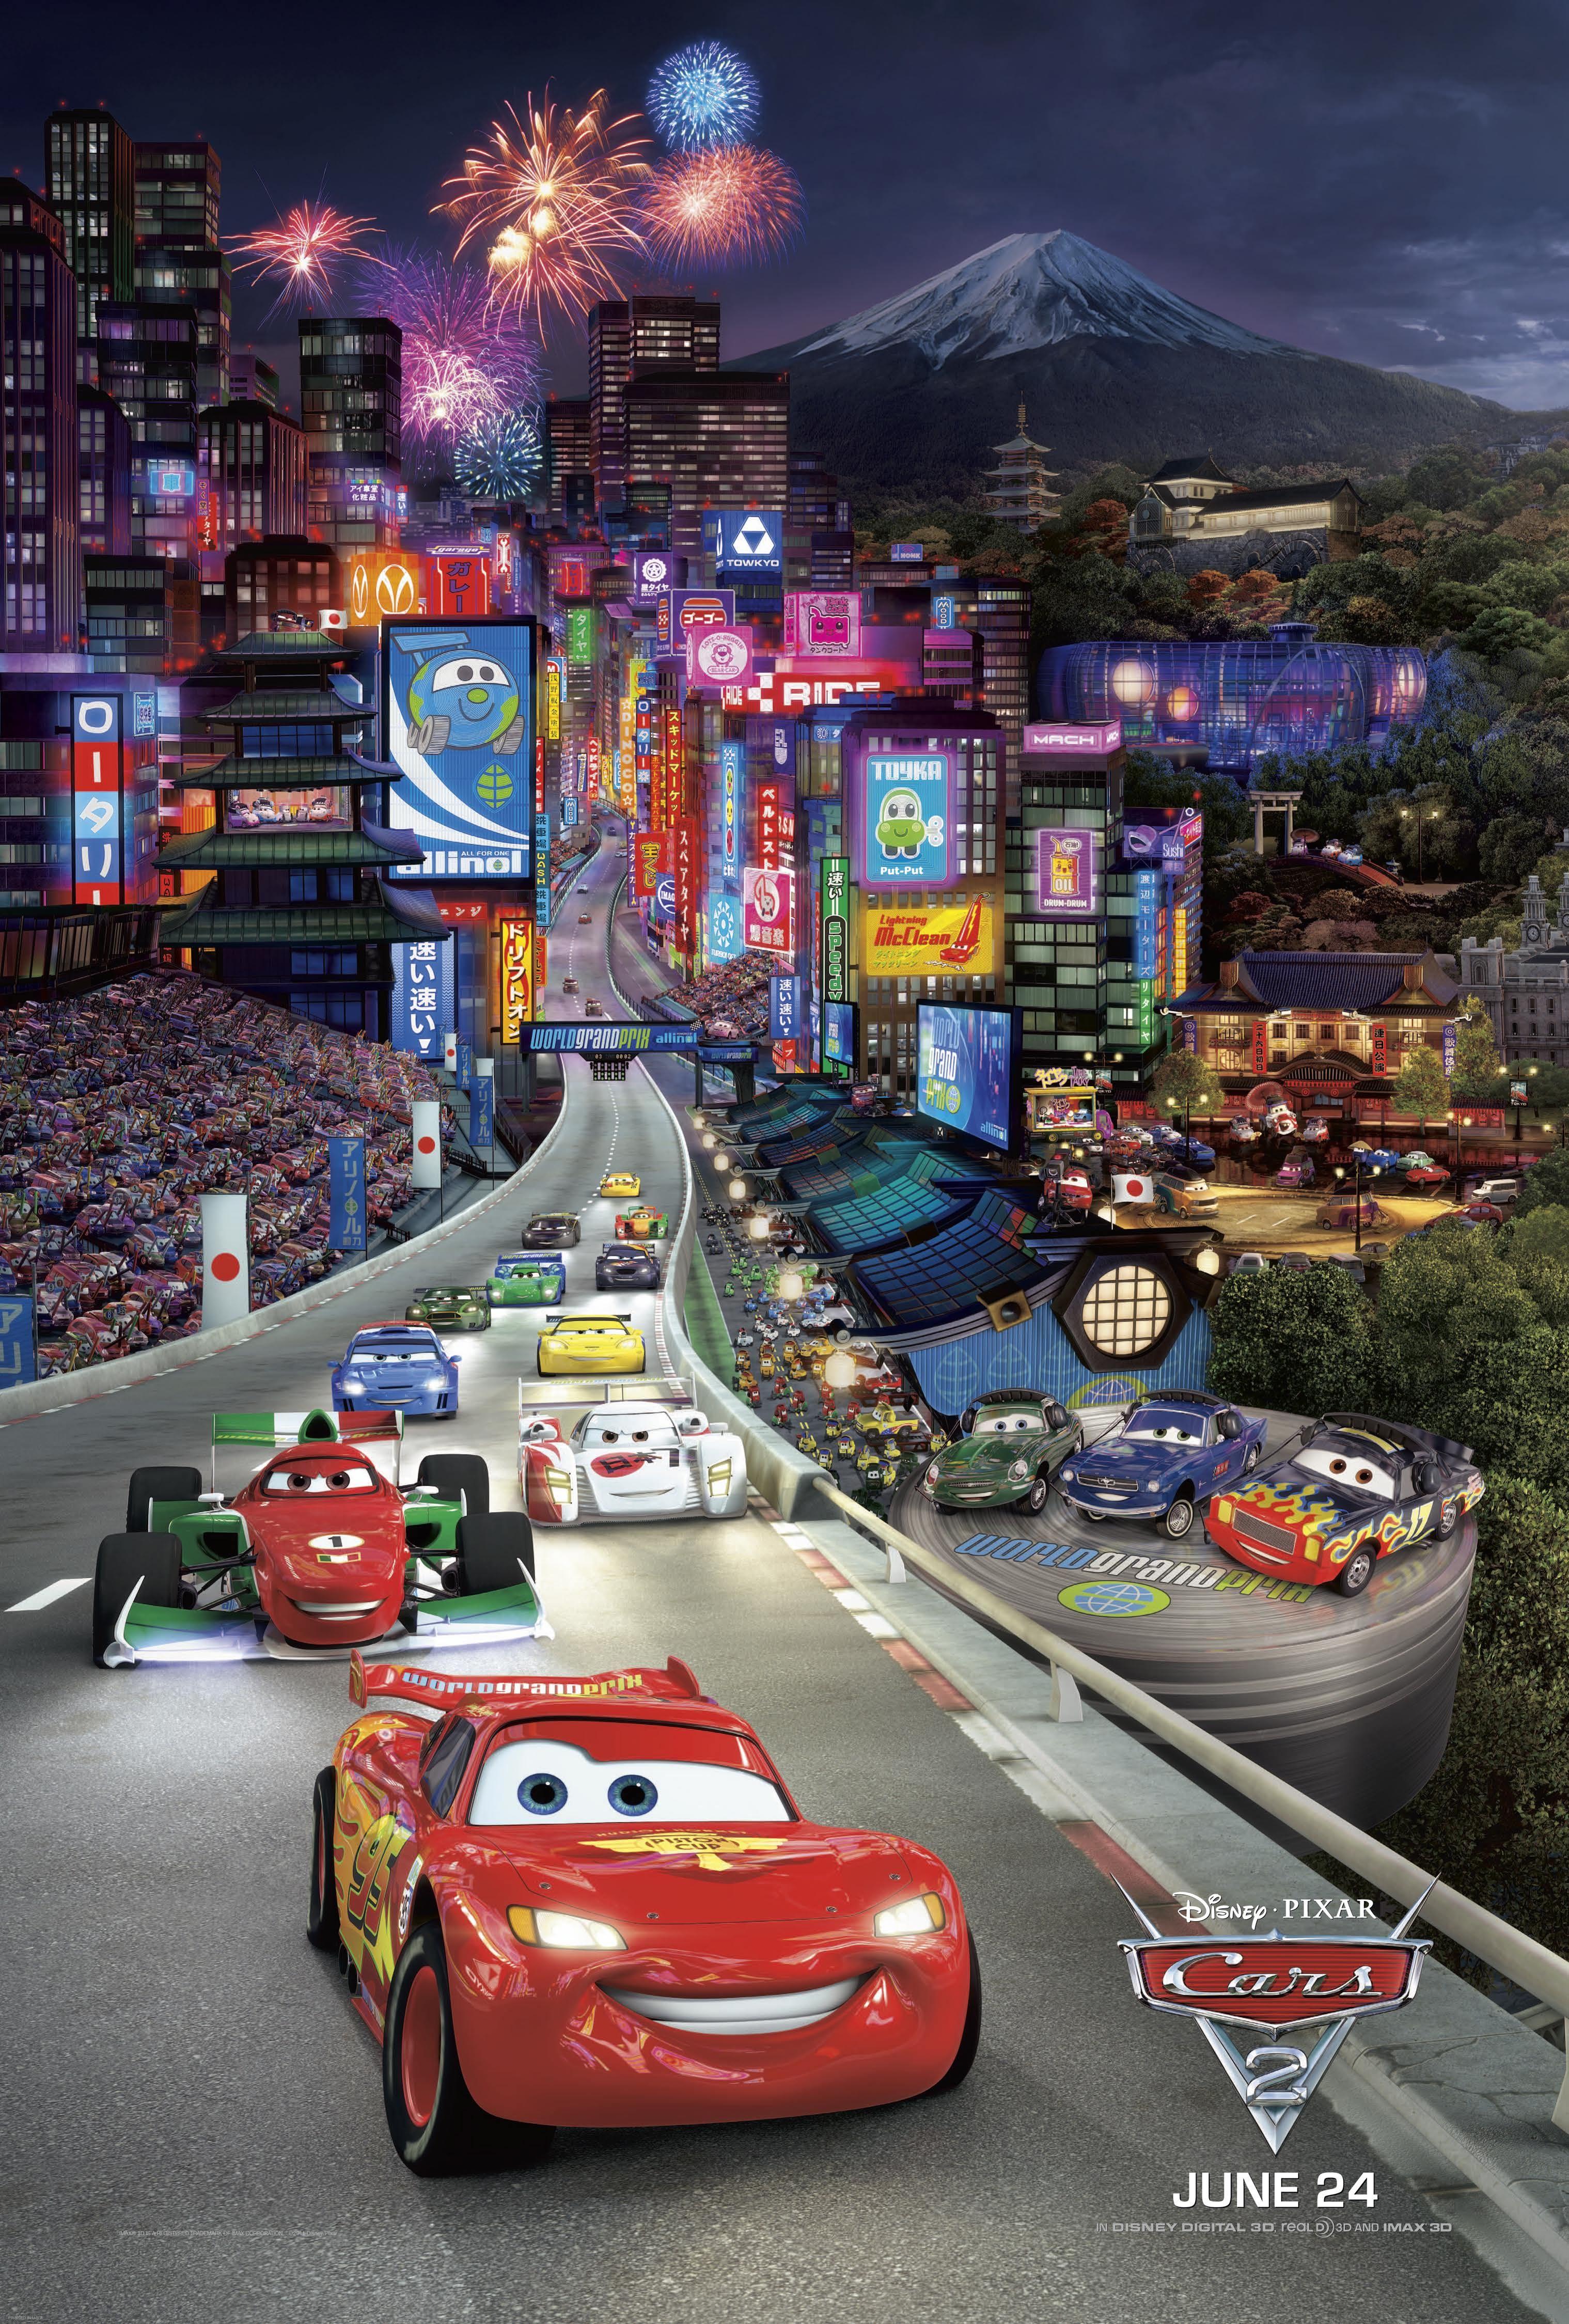 cars tokyo travel posters pinterest tokyo pixar disney cars 2 movie poster type 3 8 1 x 11